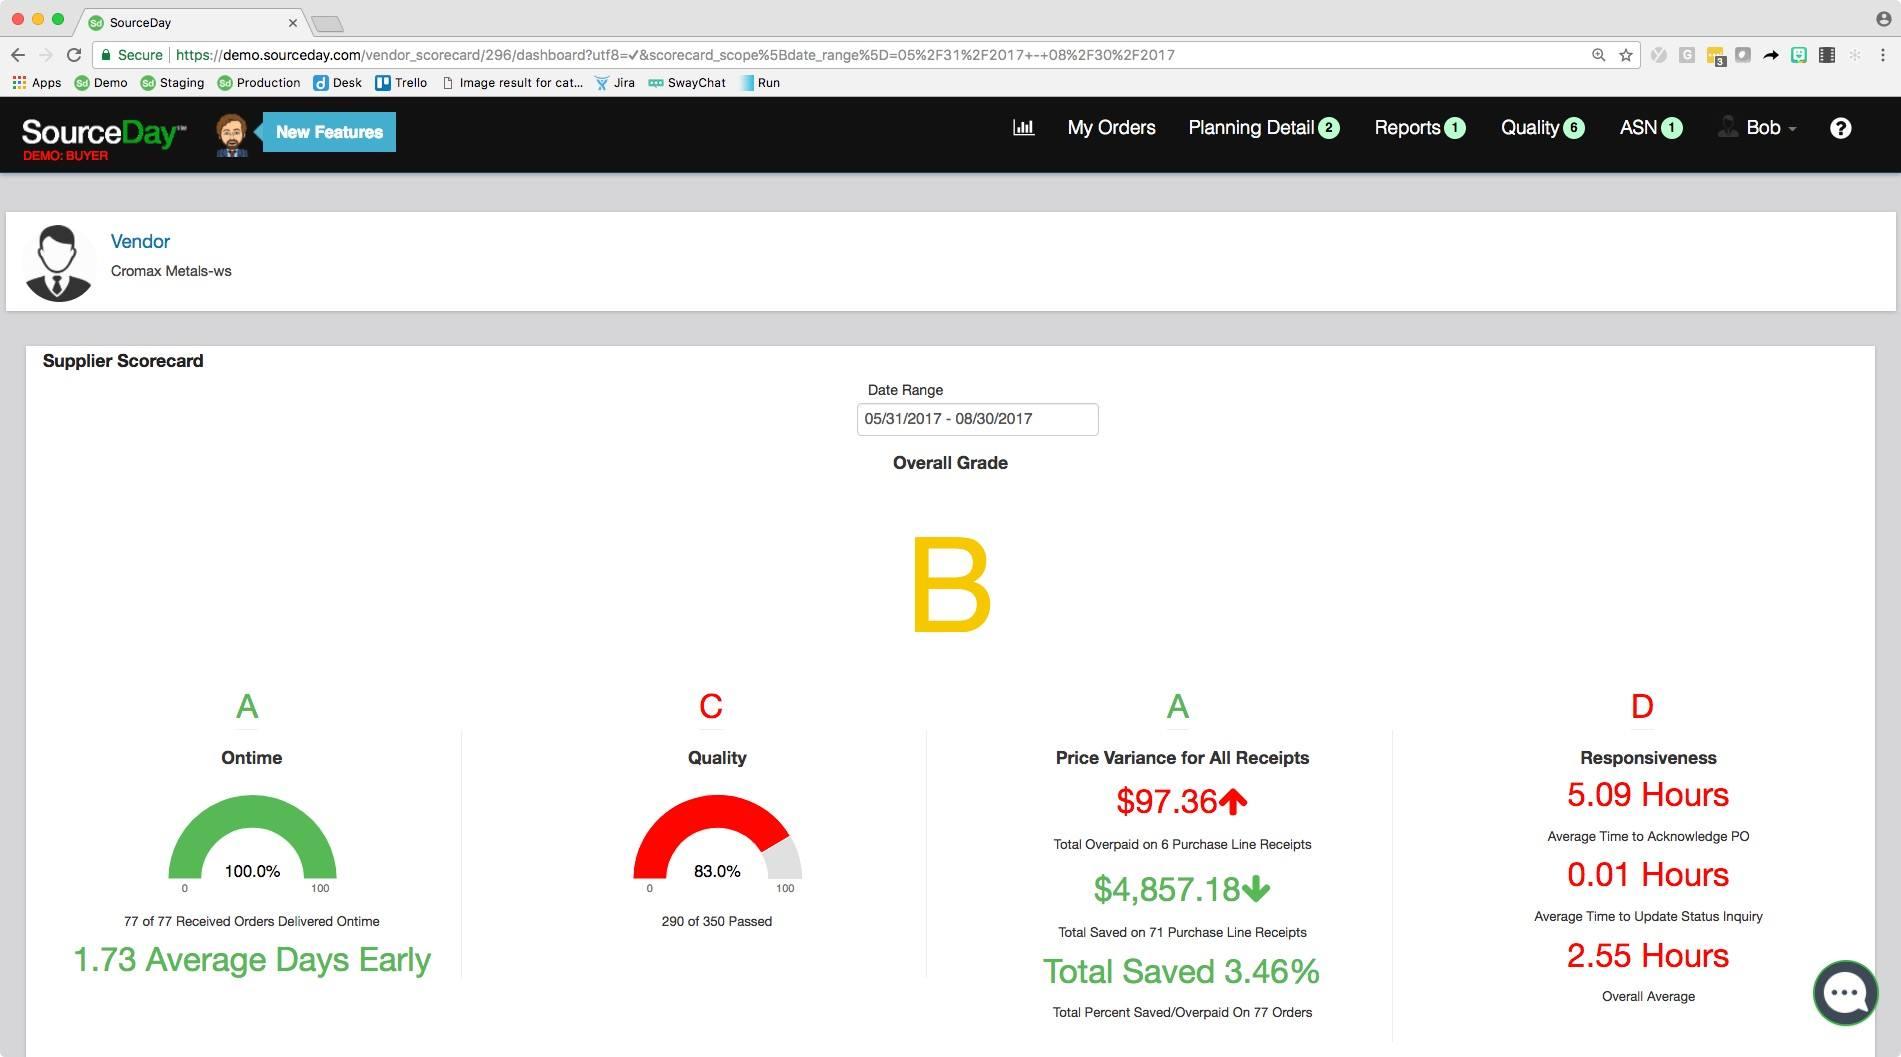 vendor_scorecard